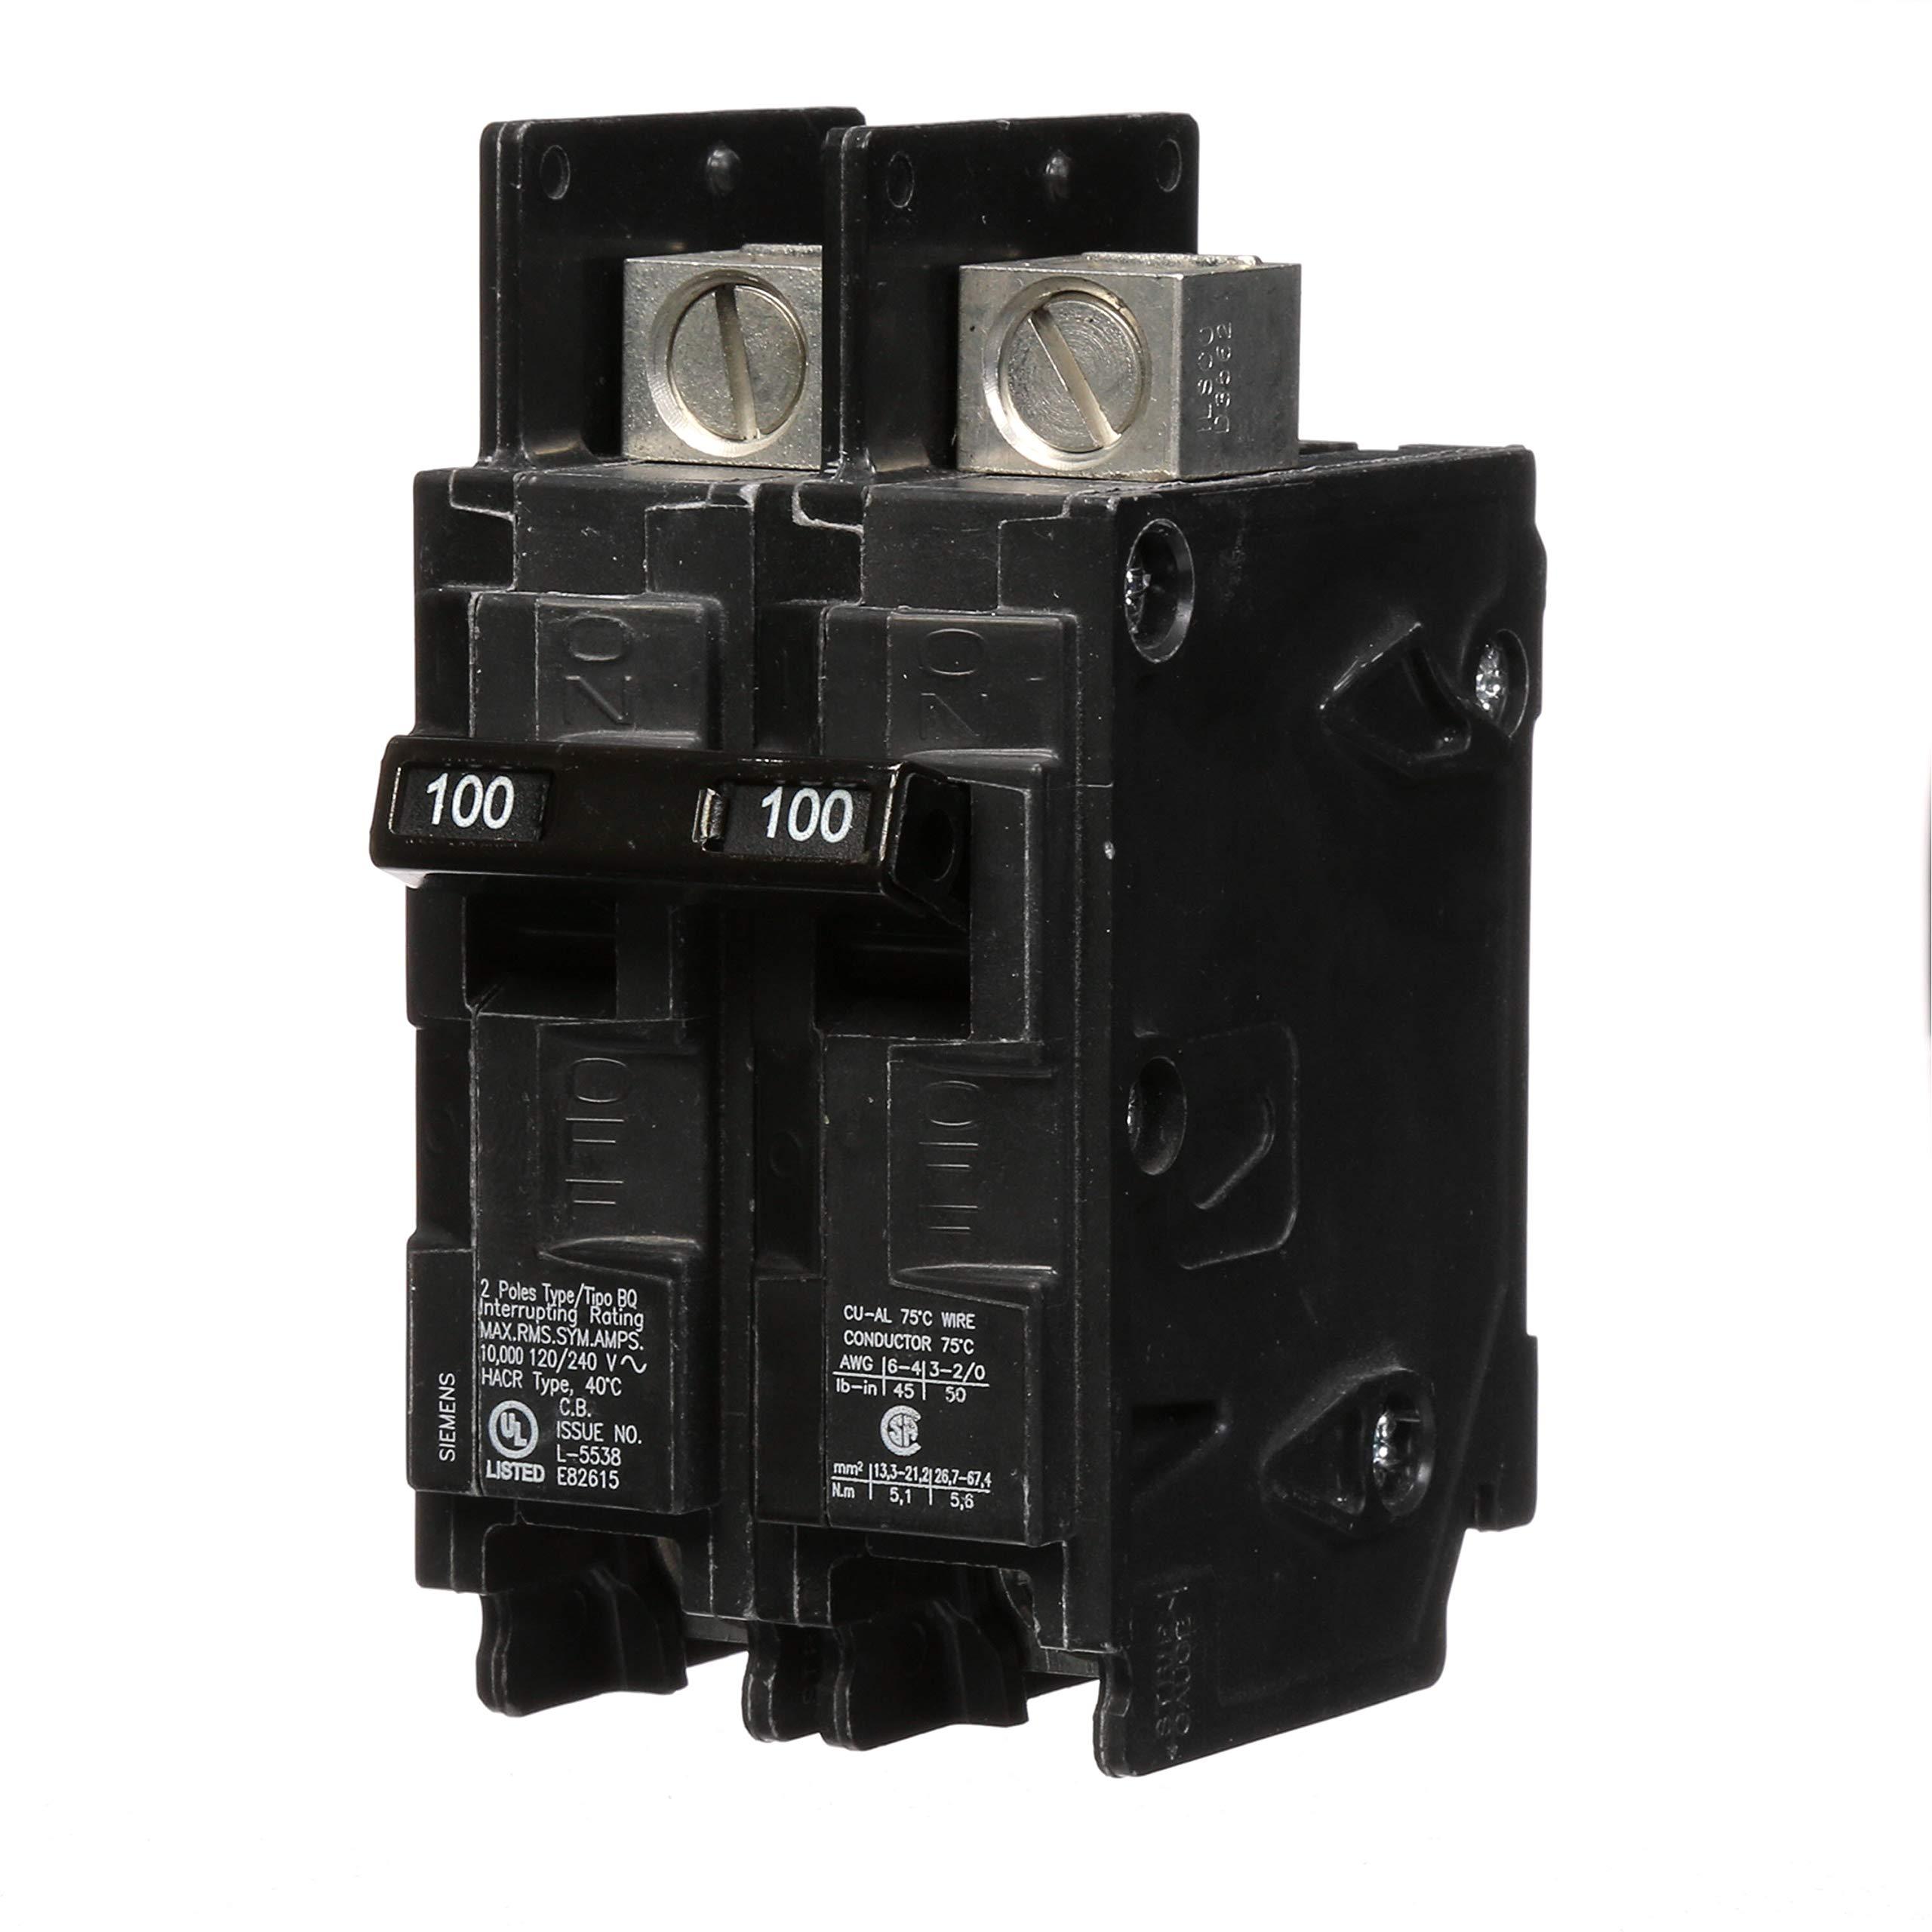 Siemens BQ2B100L 100-Amp Double Pole 120/240-Volt 10KAIC Lug In/Lug Out Breaker by SIEMENS